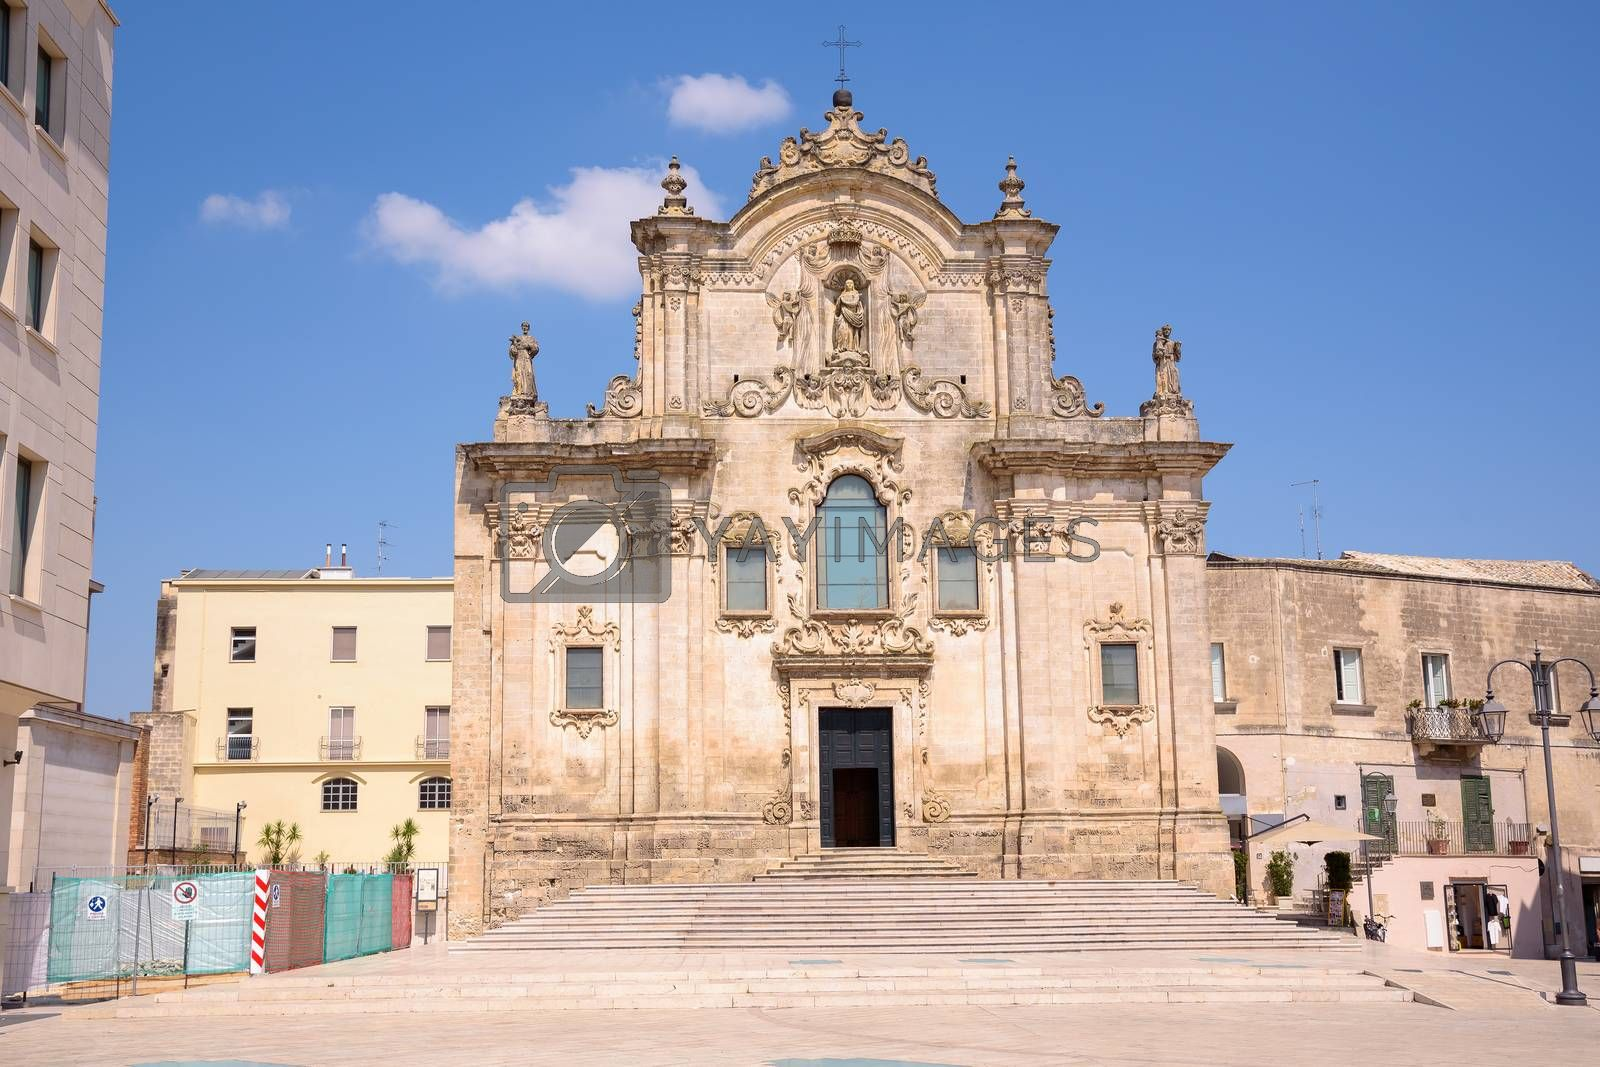 Facade of the Church of Saint Francis of Assisi in Matera, Basilicata, Italy